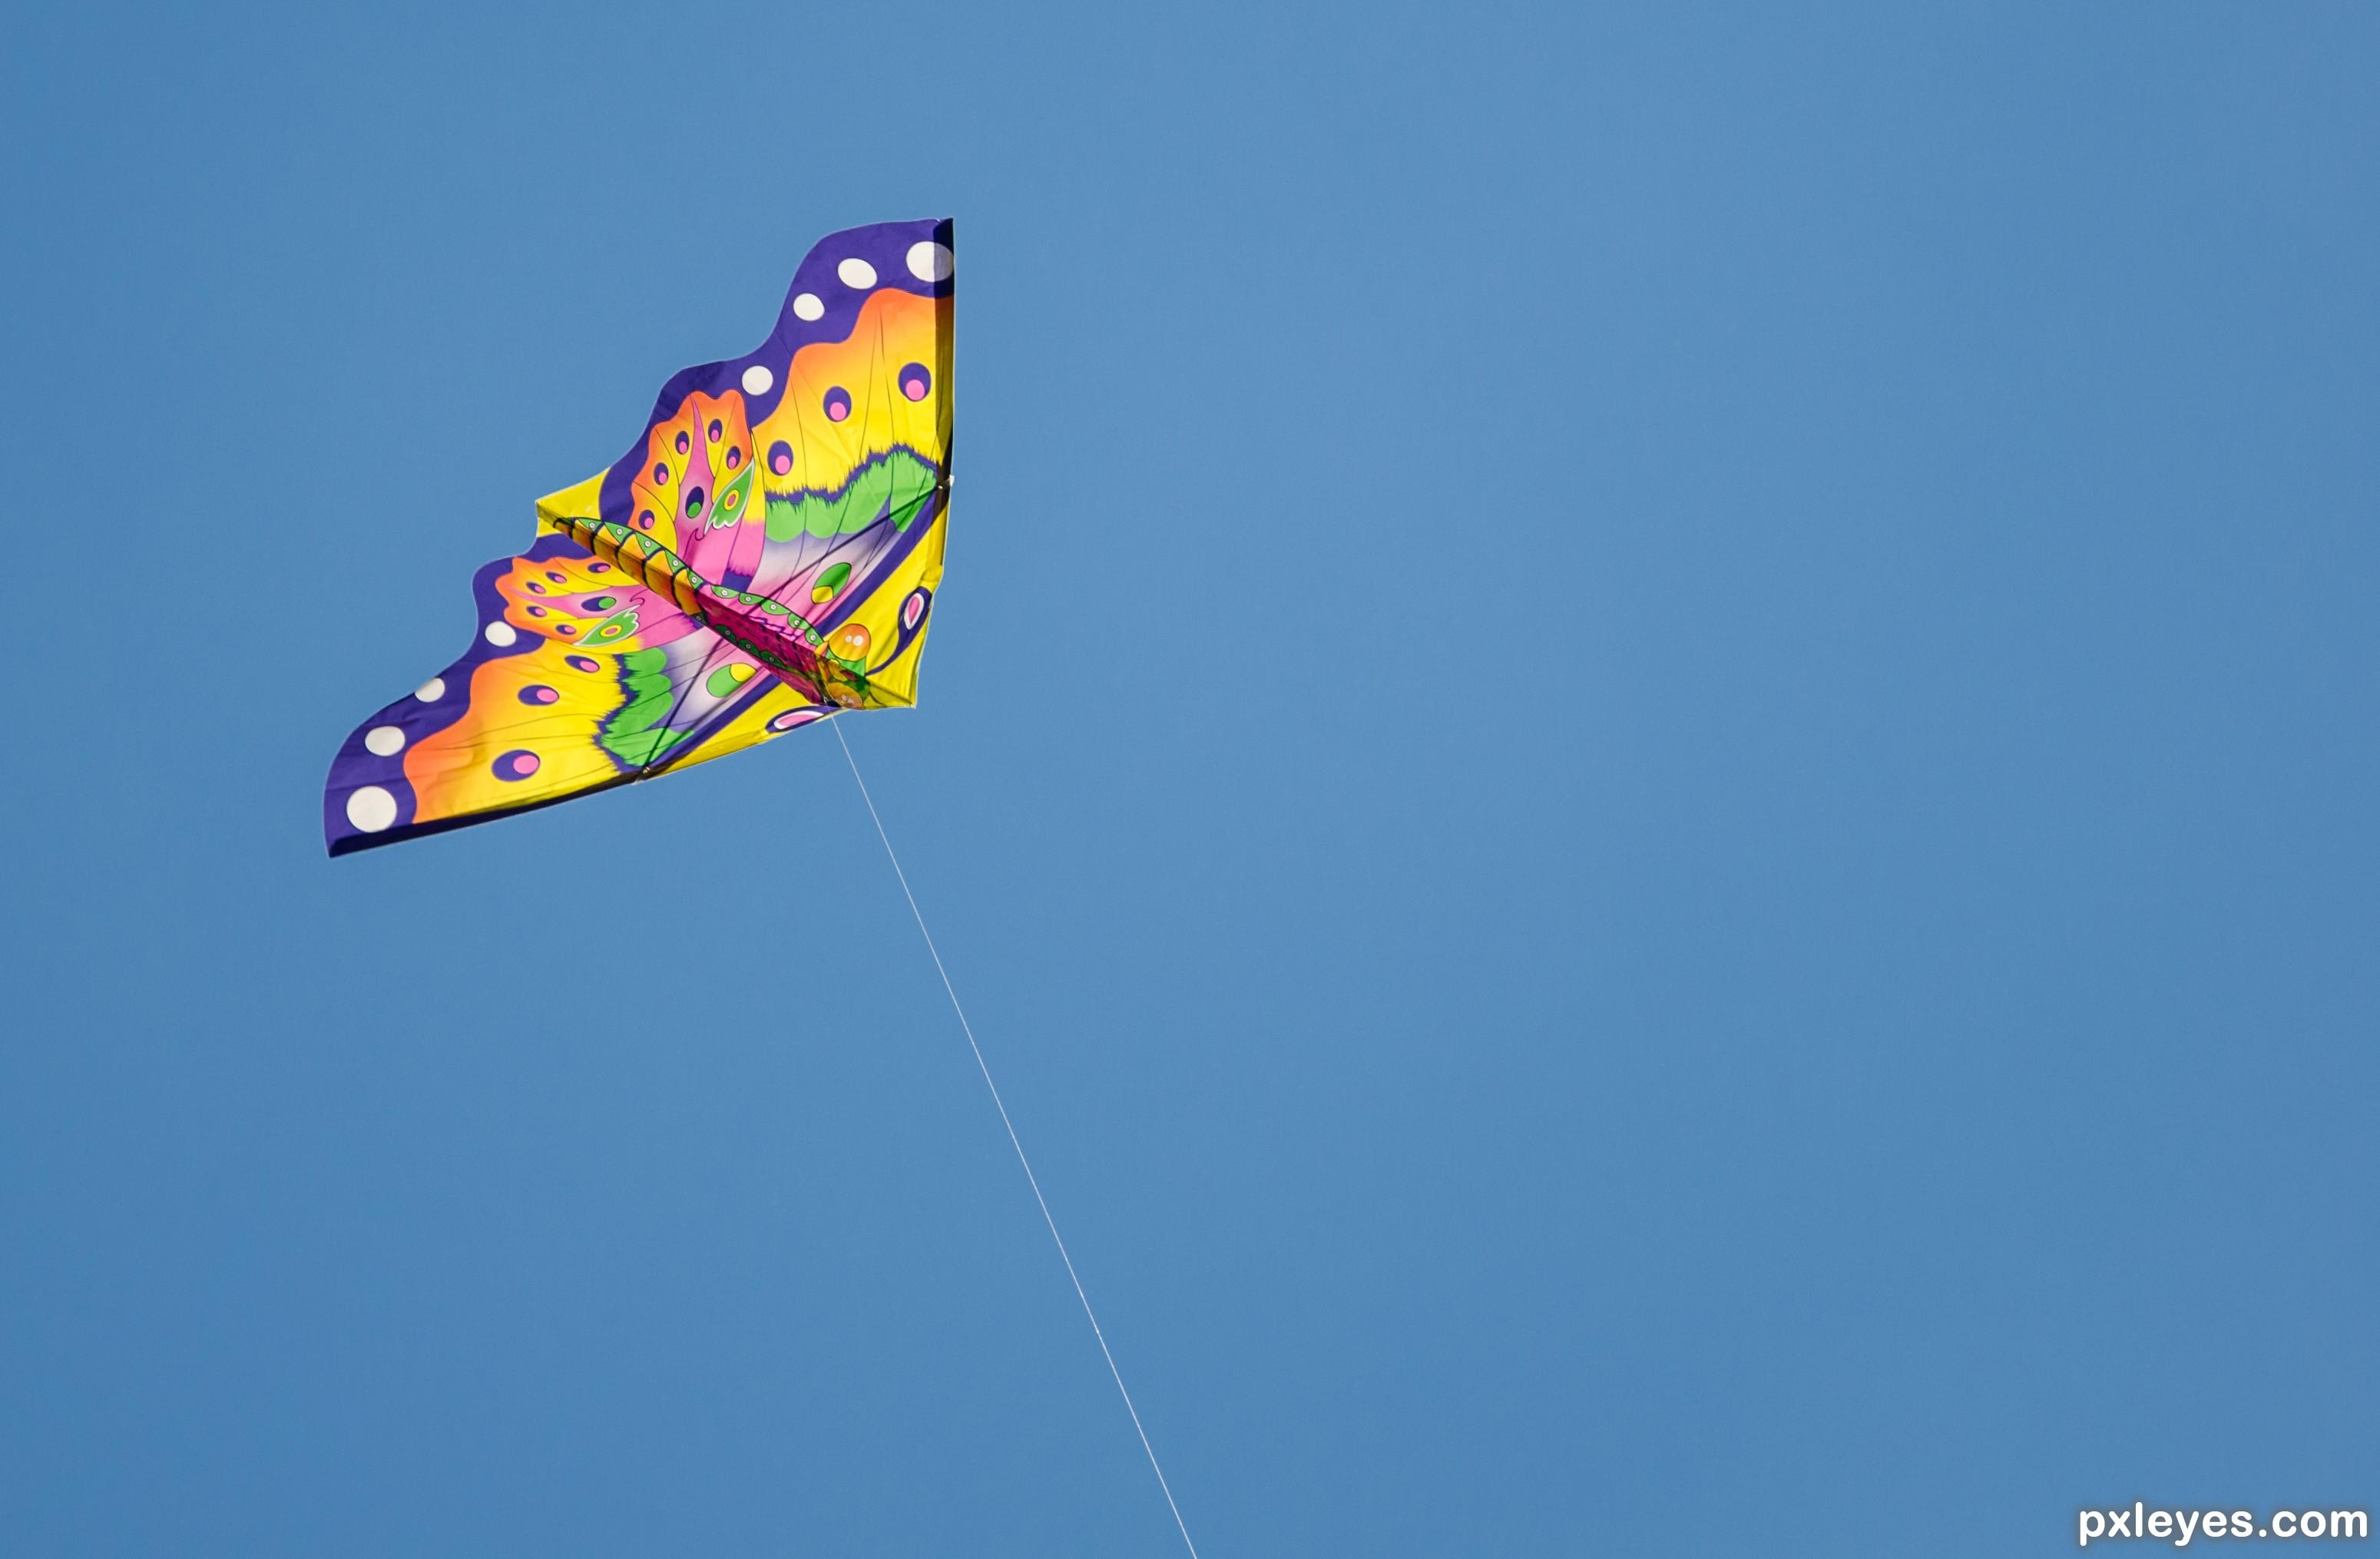 Tetrahedral Kite Flying